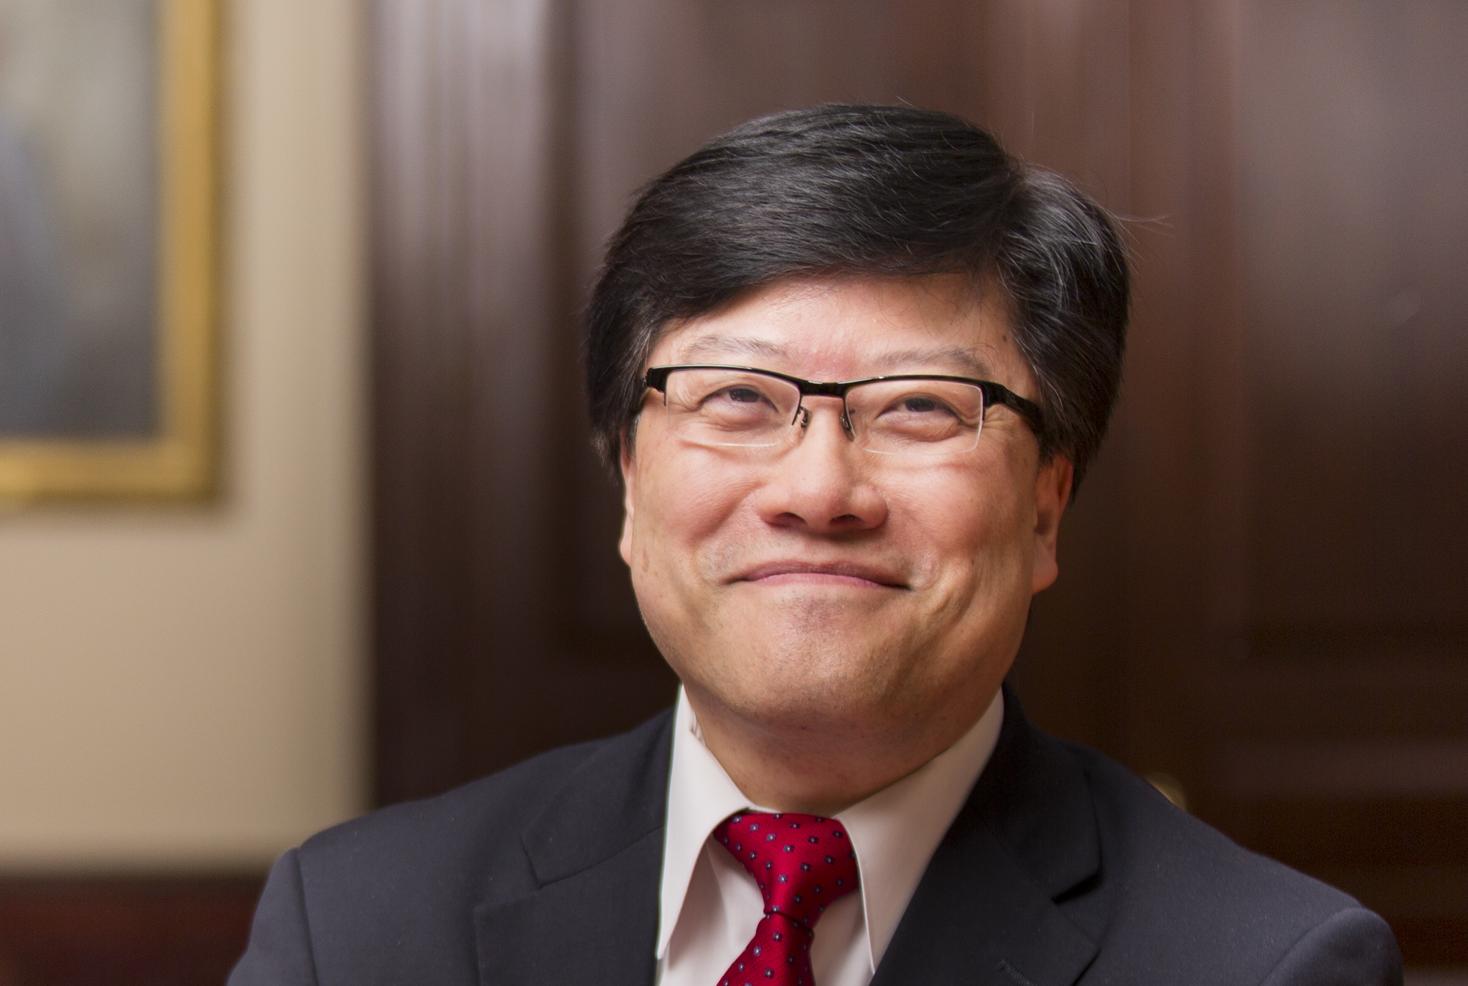 Dr. Augustine M.K. Choi. Photo credit: John Abbott